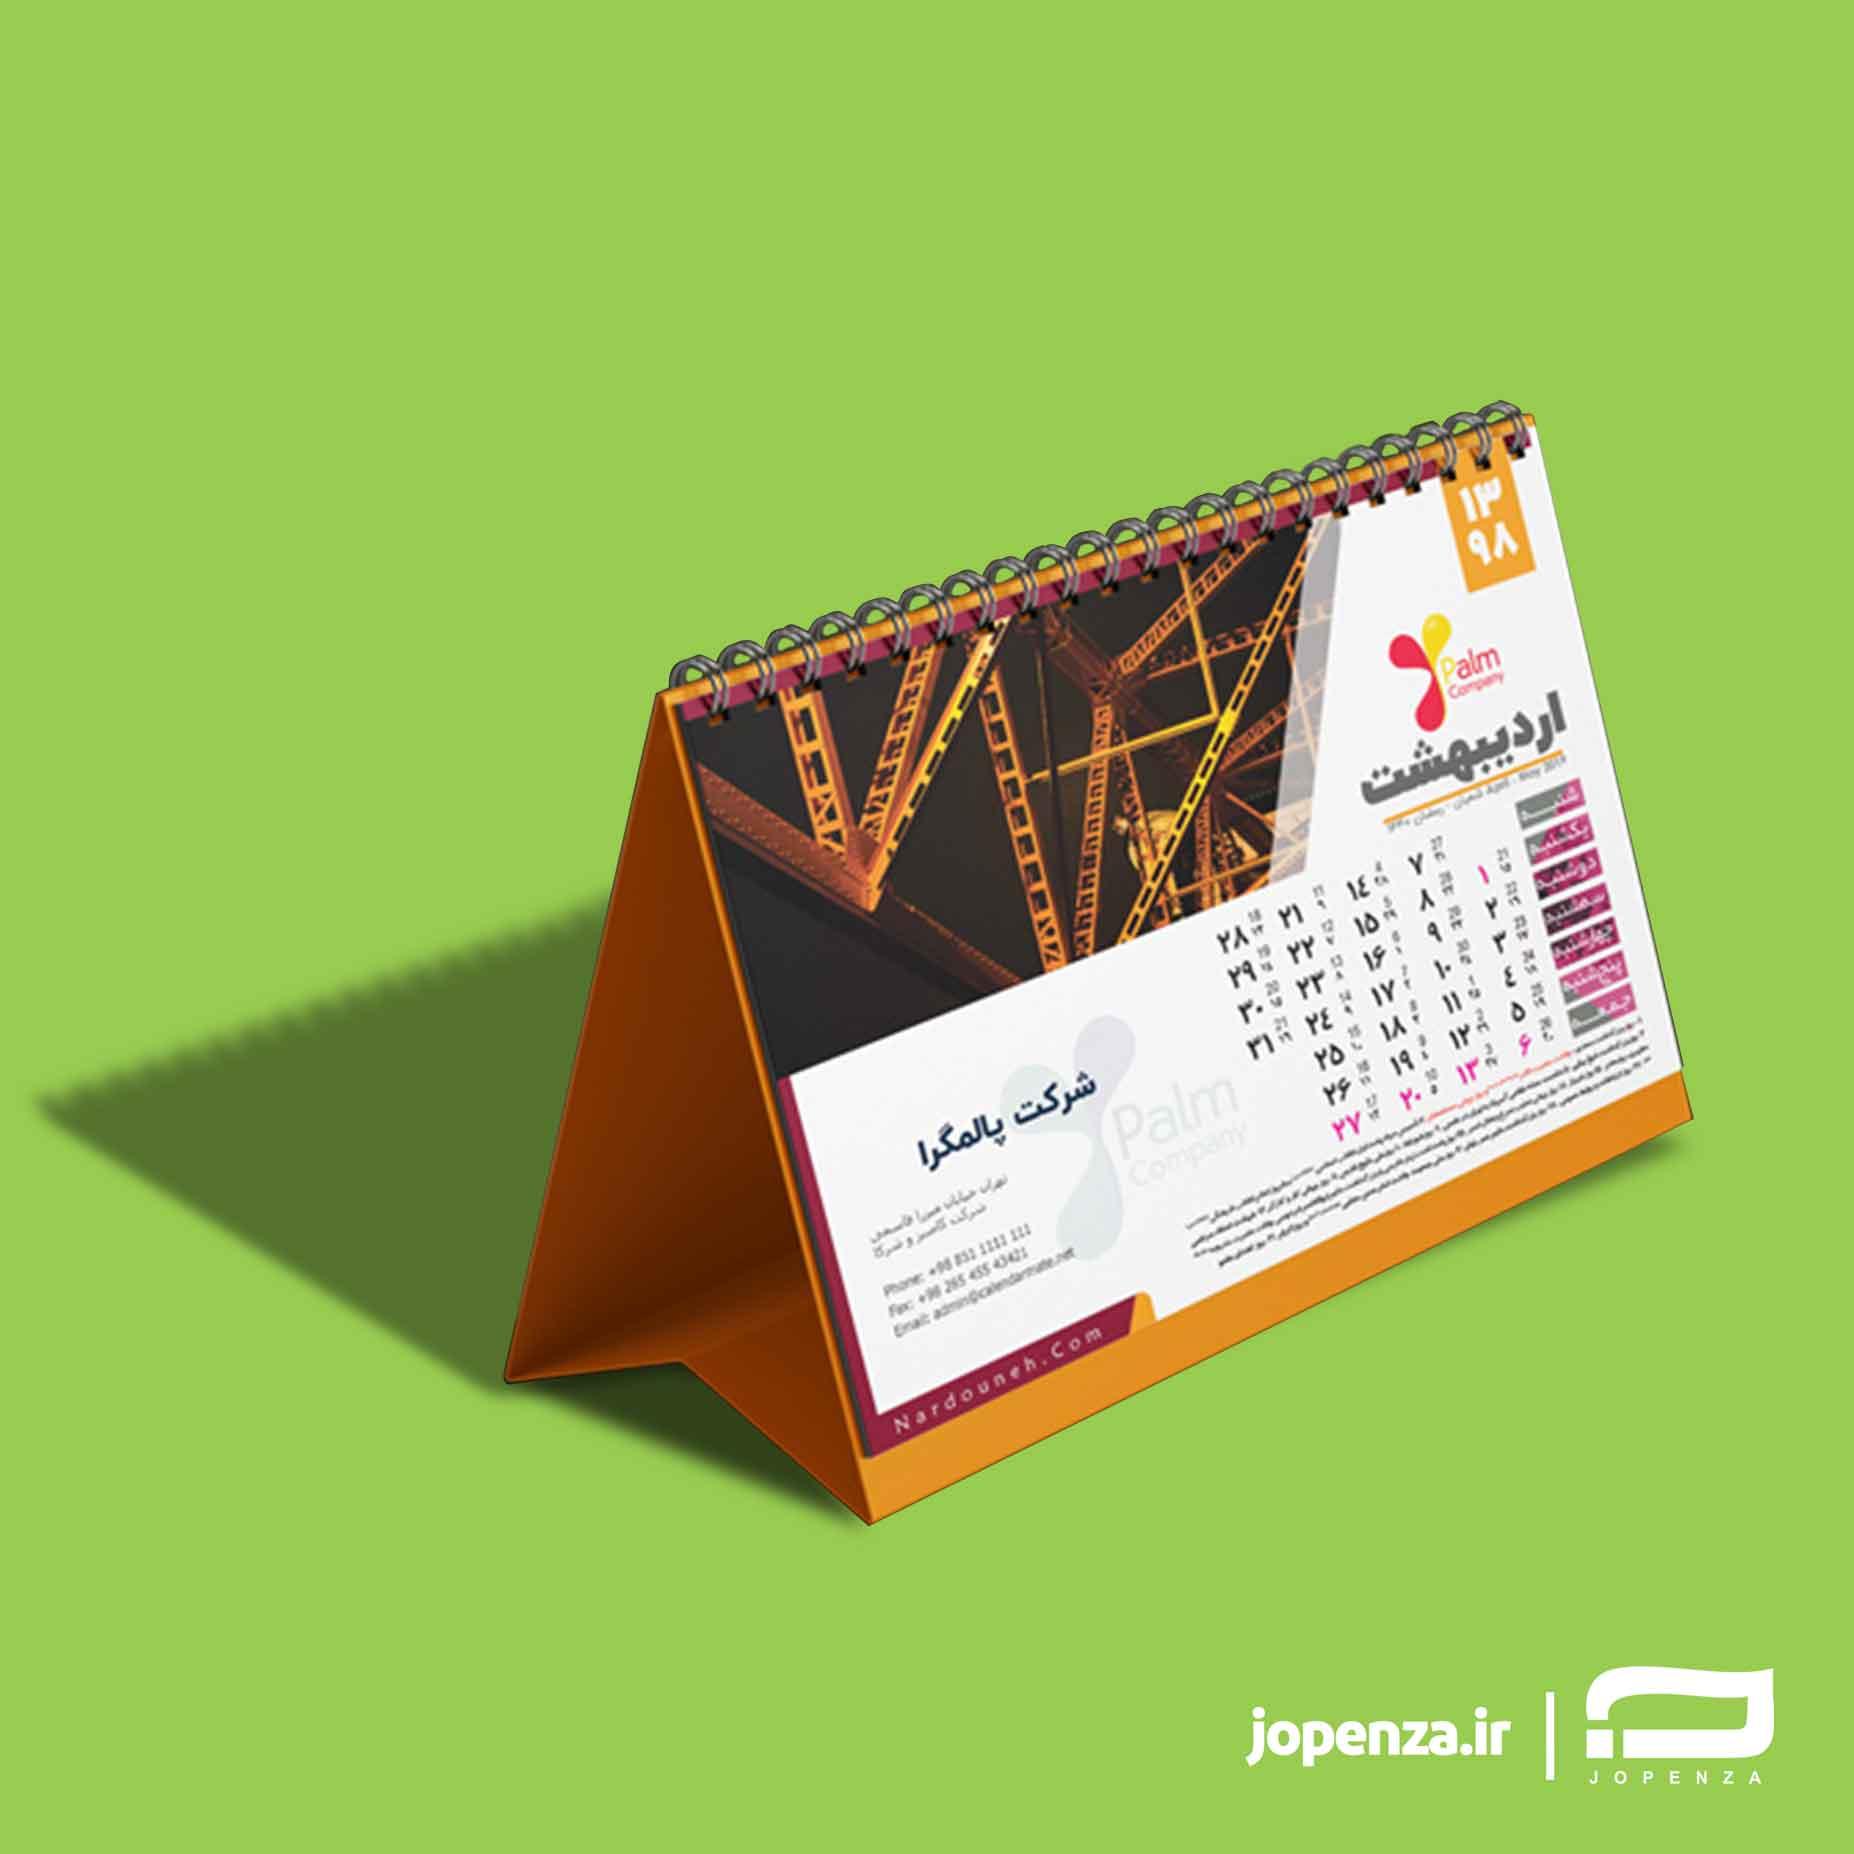 طراحی تقویم رومیزی